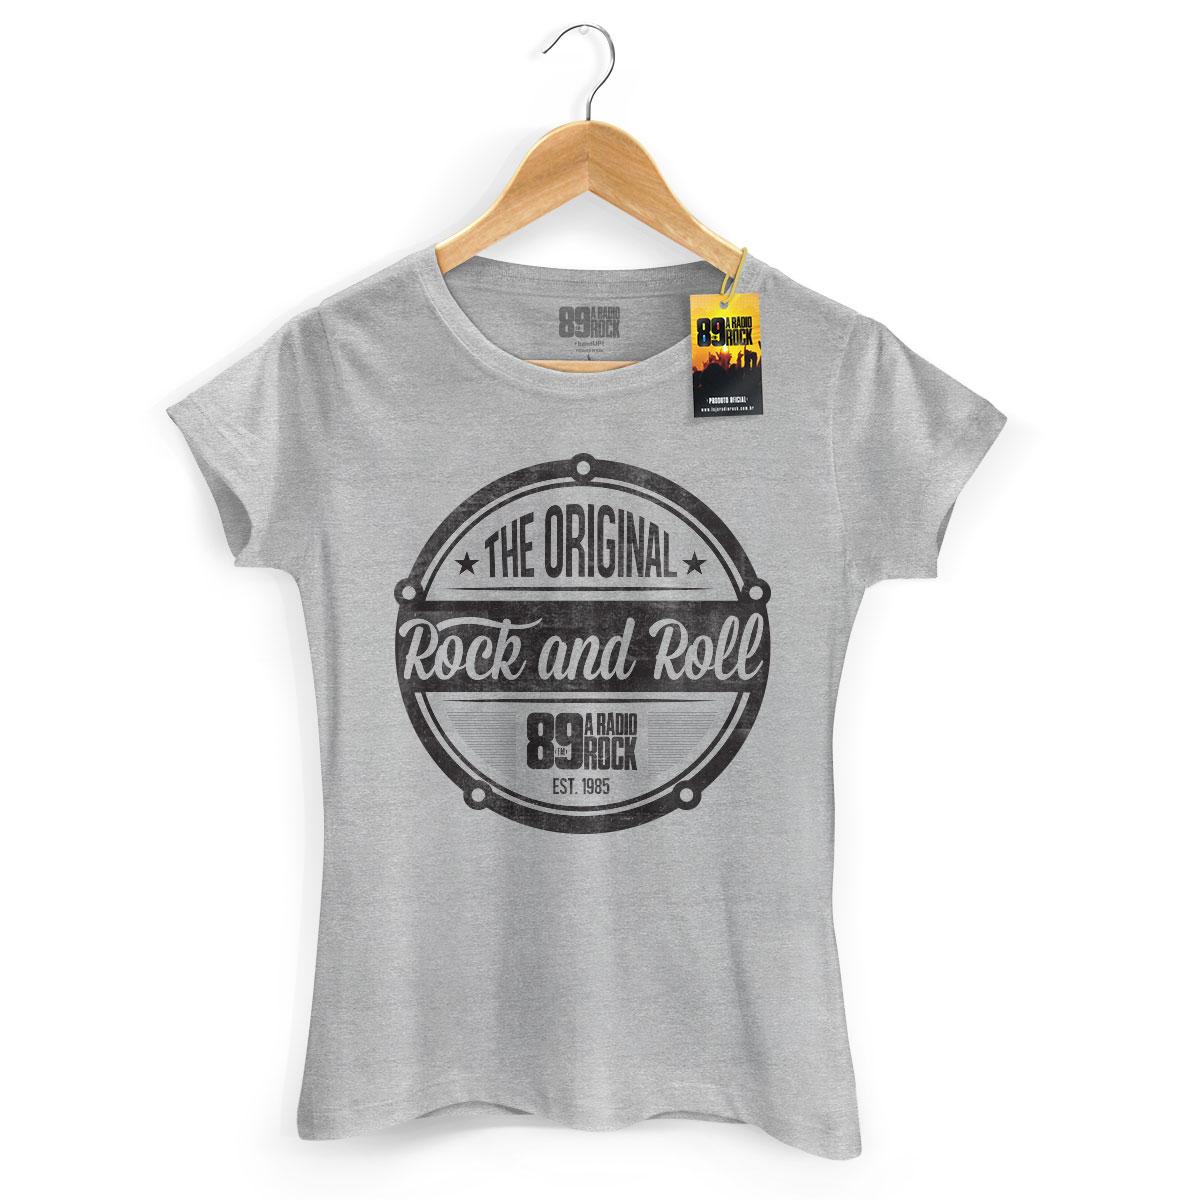 Camiseta Feminina 89FM A Rádio Rock - The Original Rock And Roll